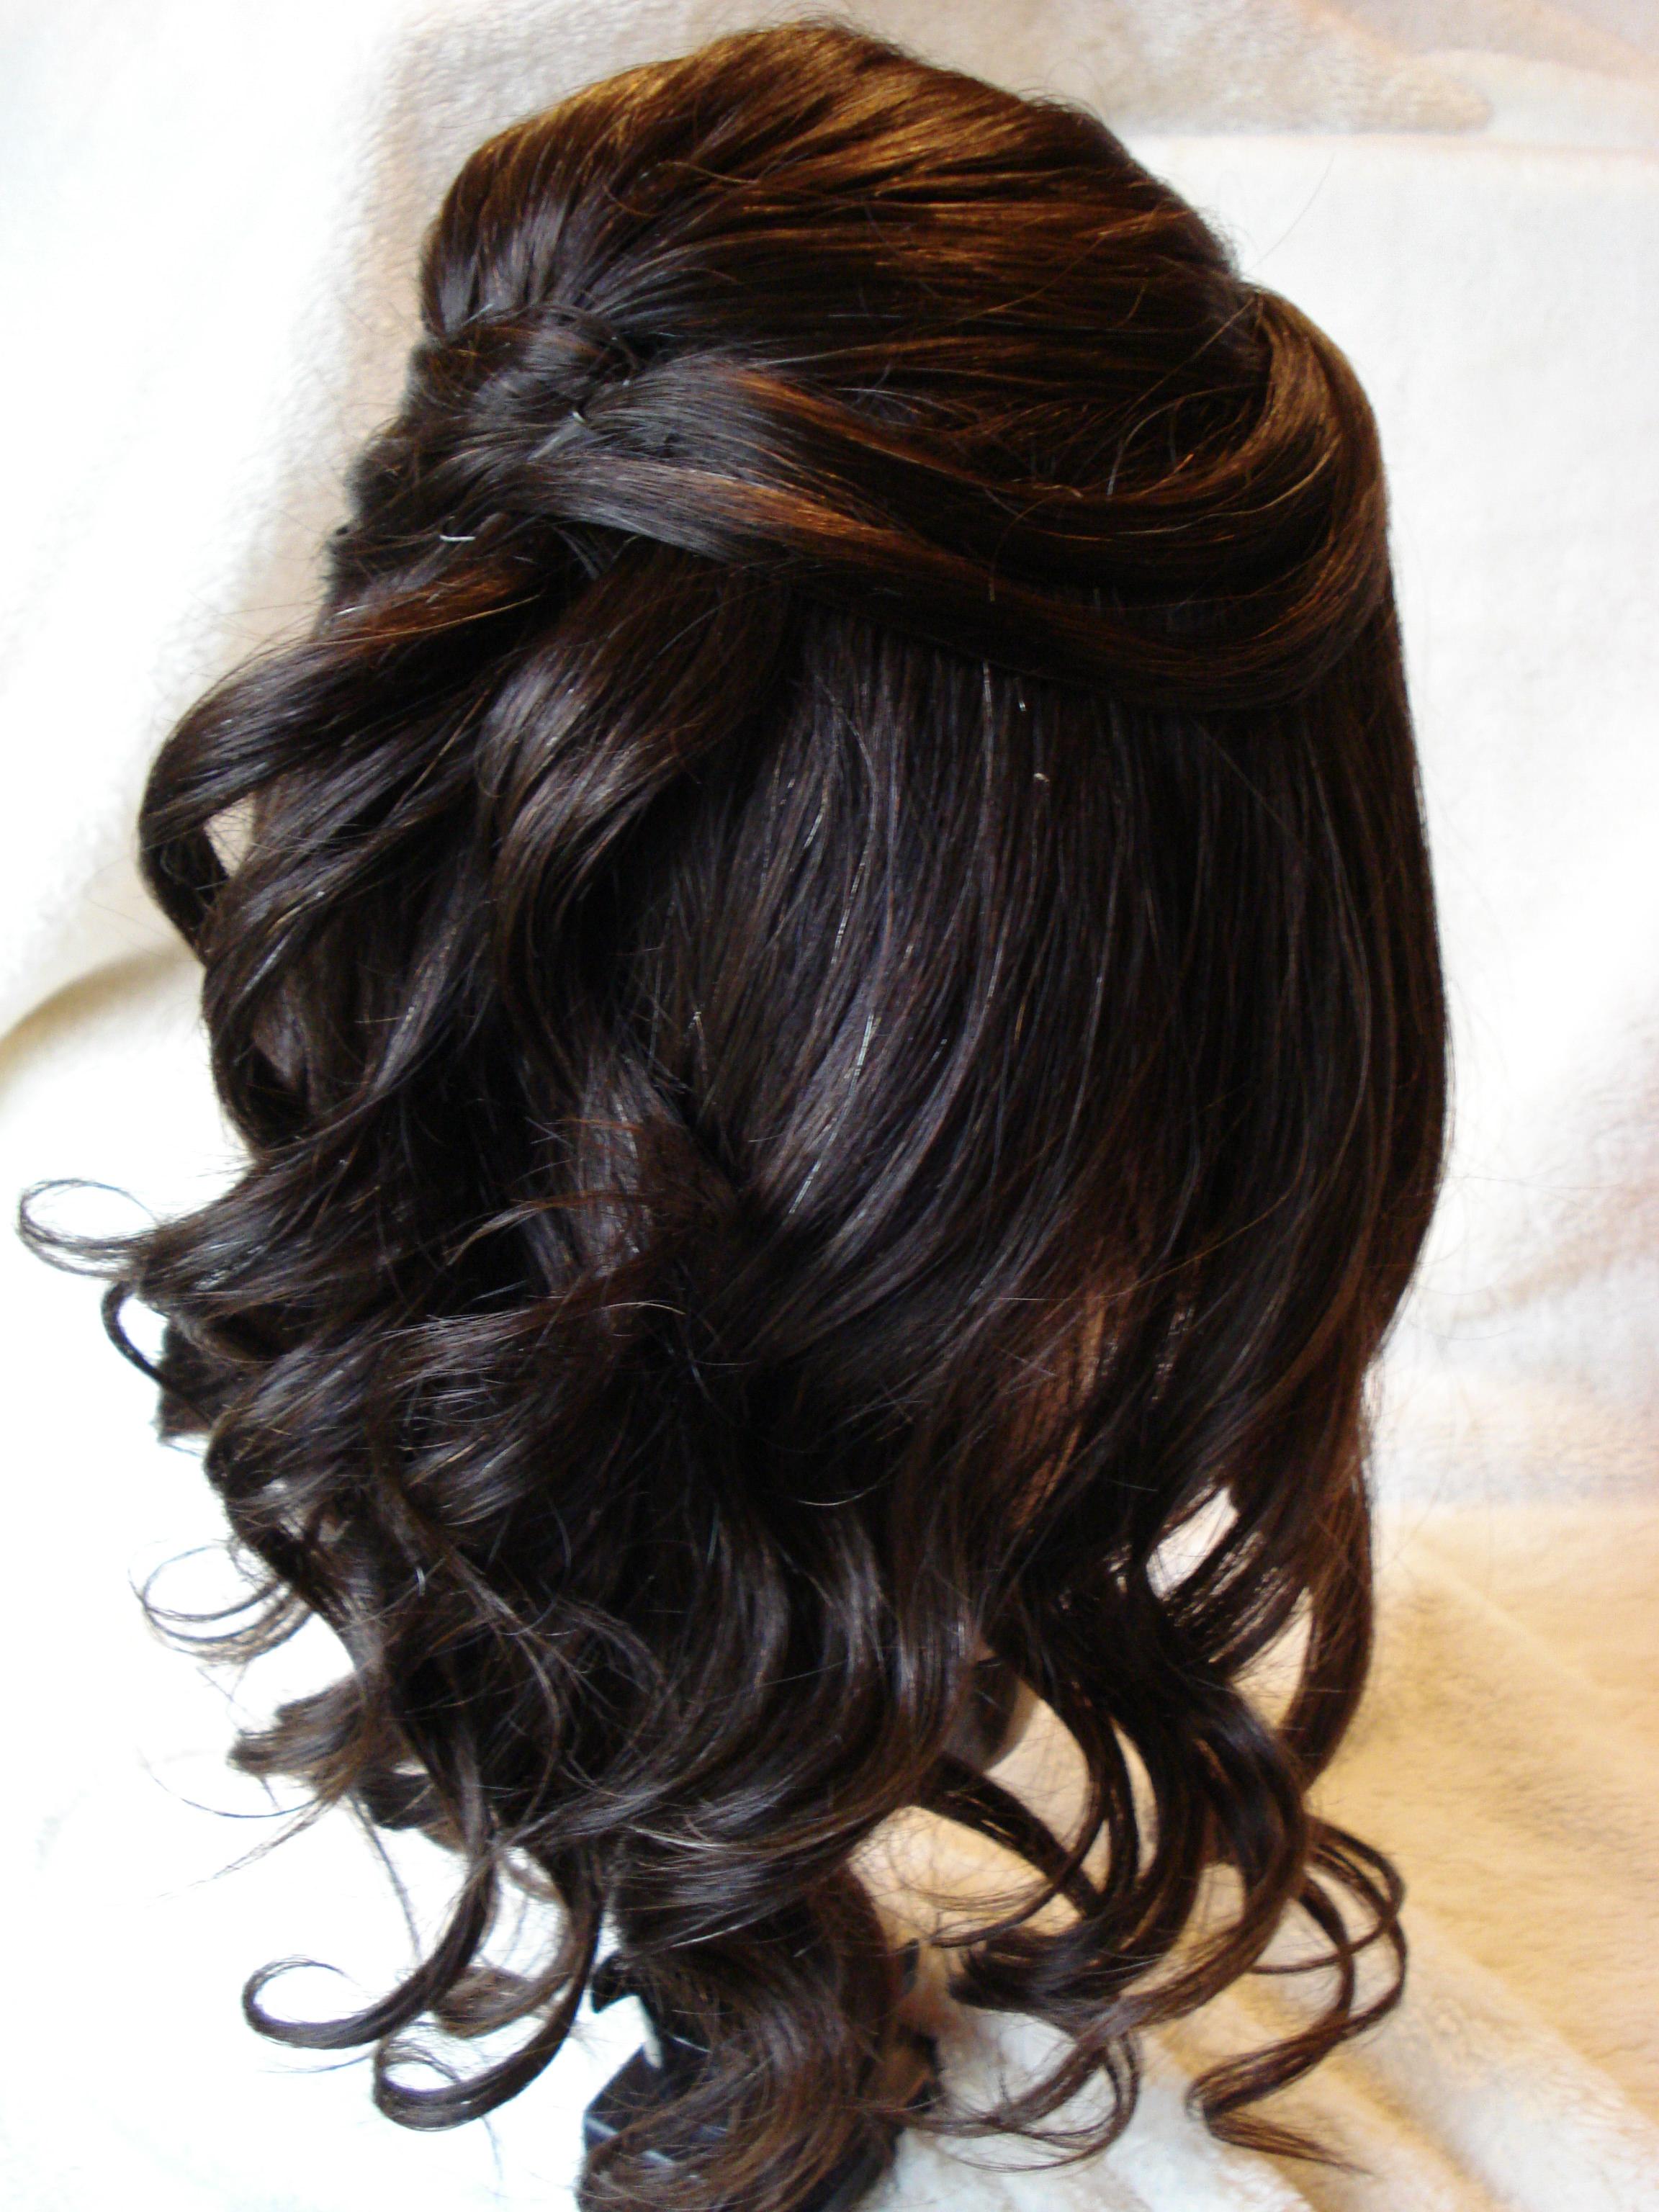 30 HalfupHalf down Wedding Hair Style  Hairstyles  Design Trends  Premium PSD Vector